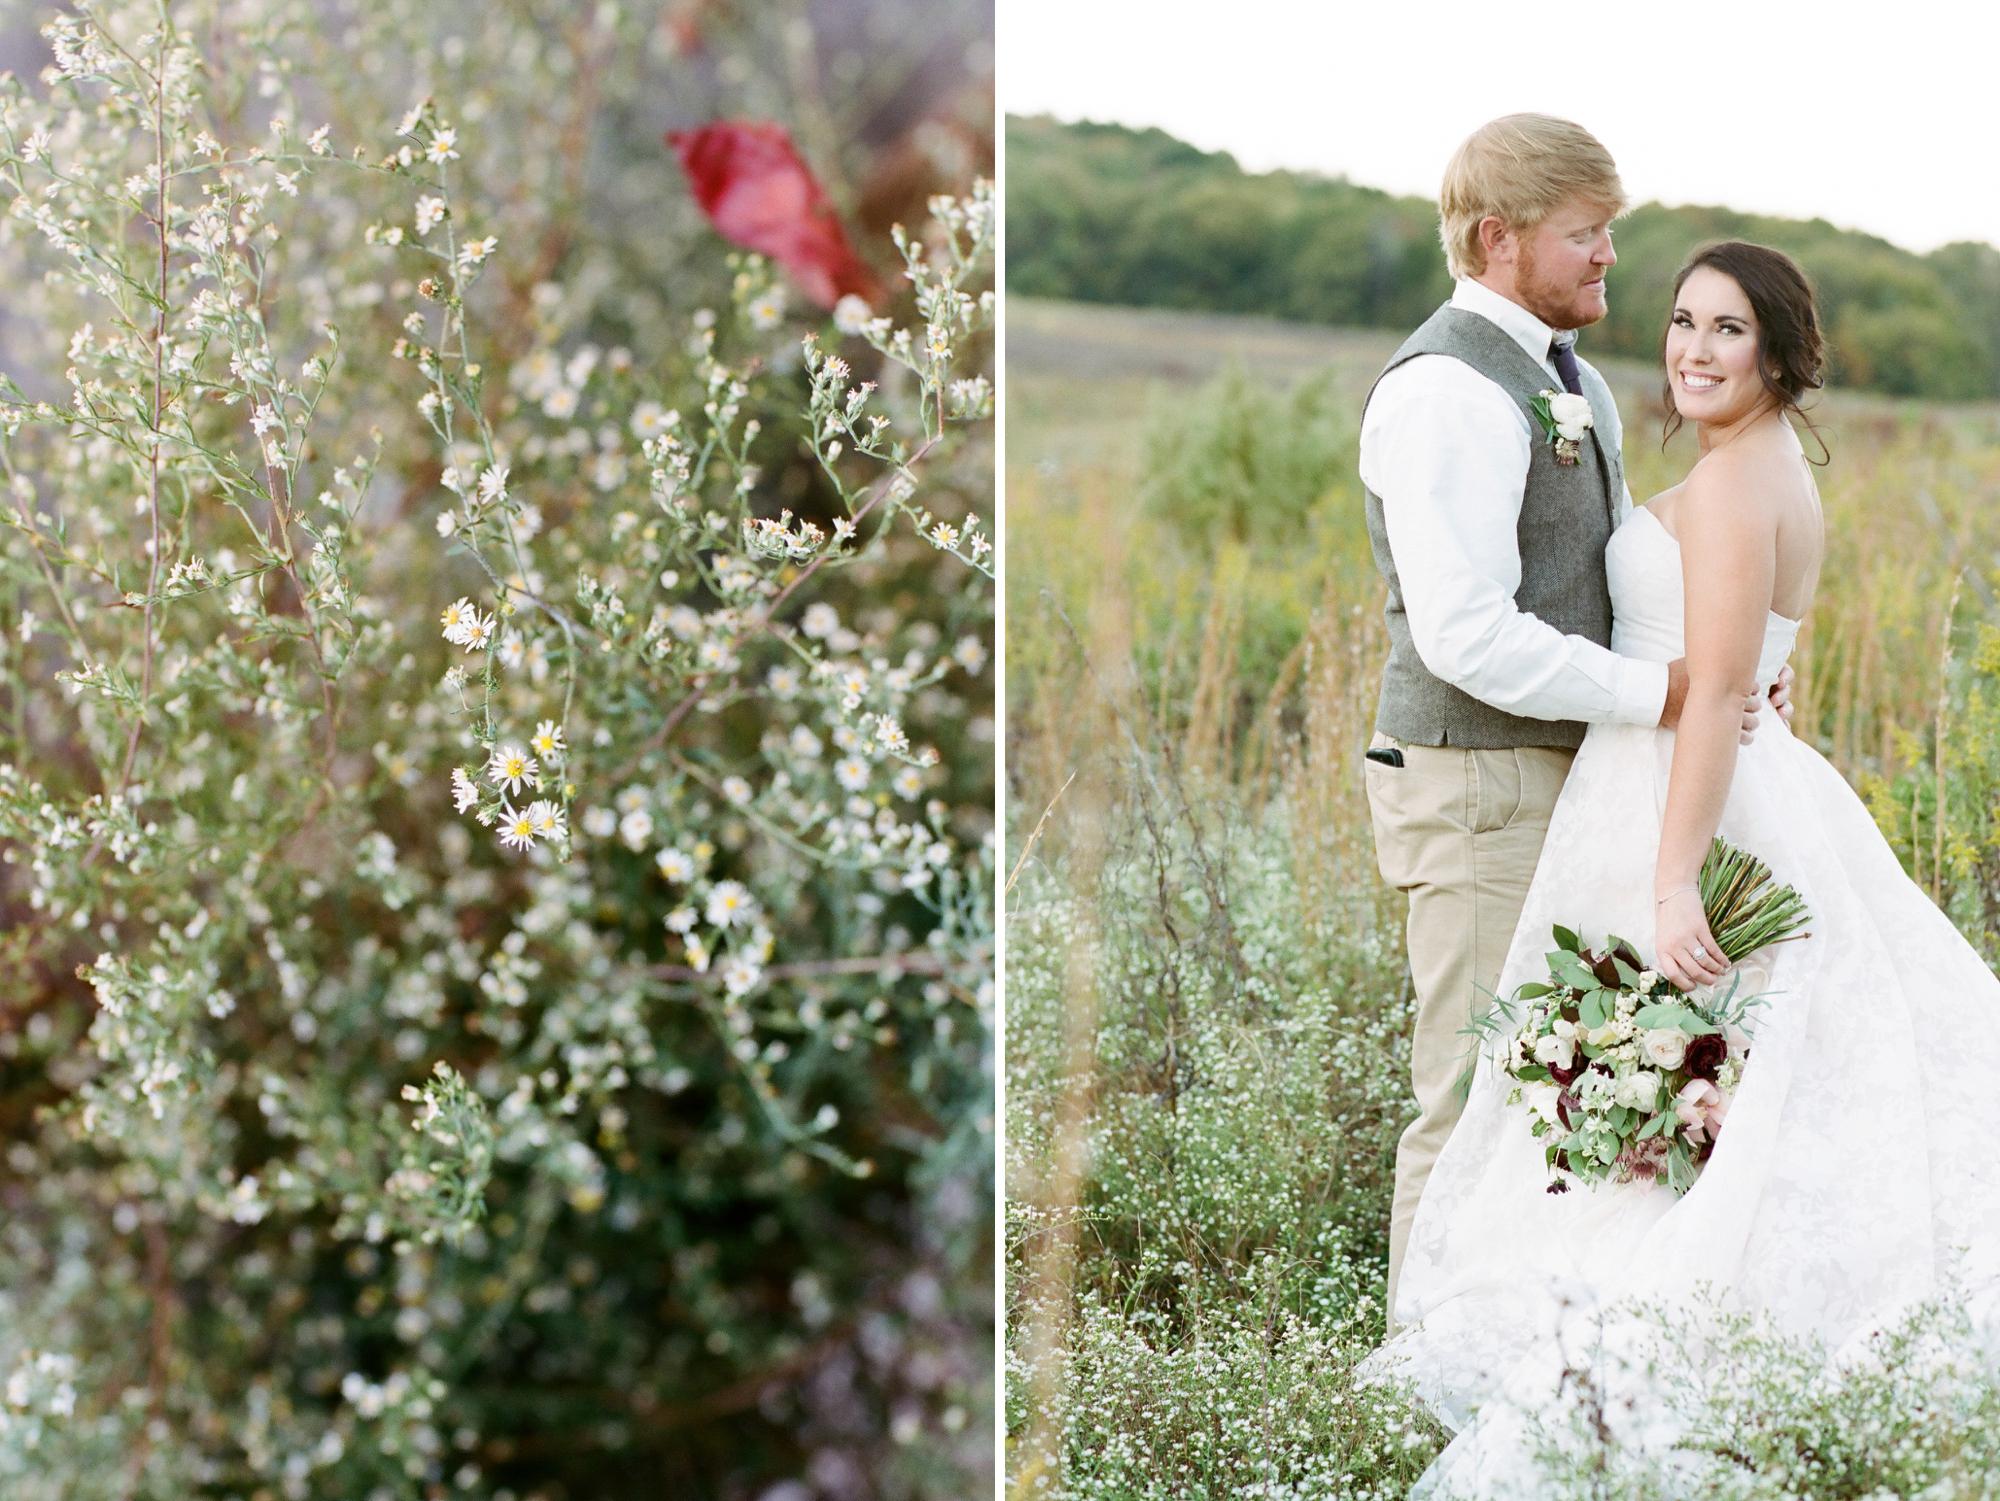 southern-weddings-film-photographer_0051